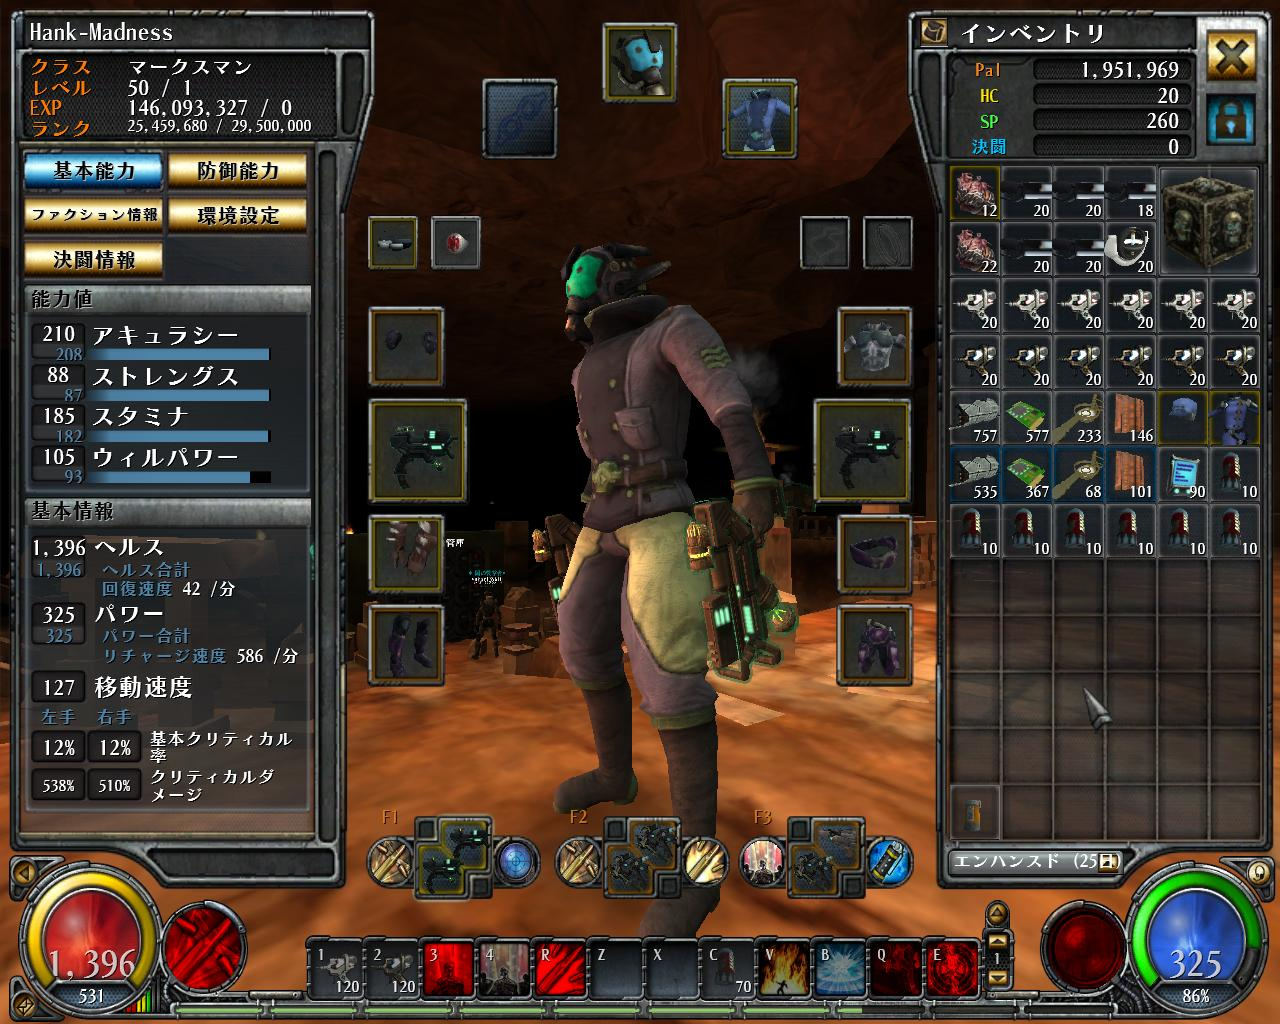 Hellgate_2011_2_27 16_35_53